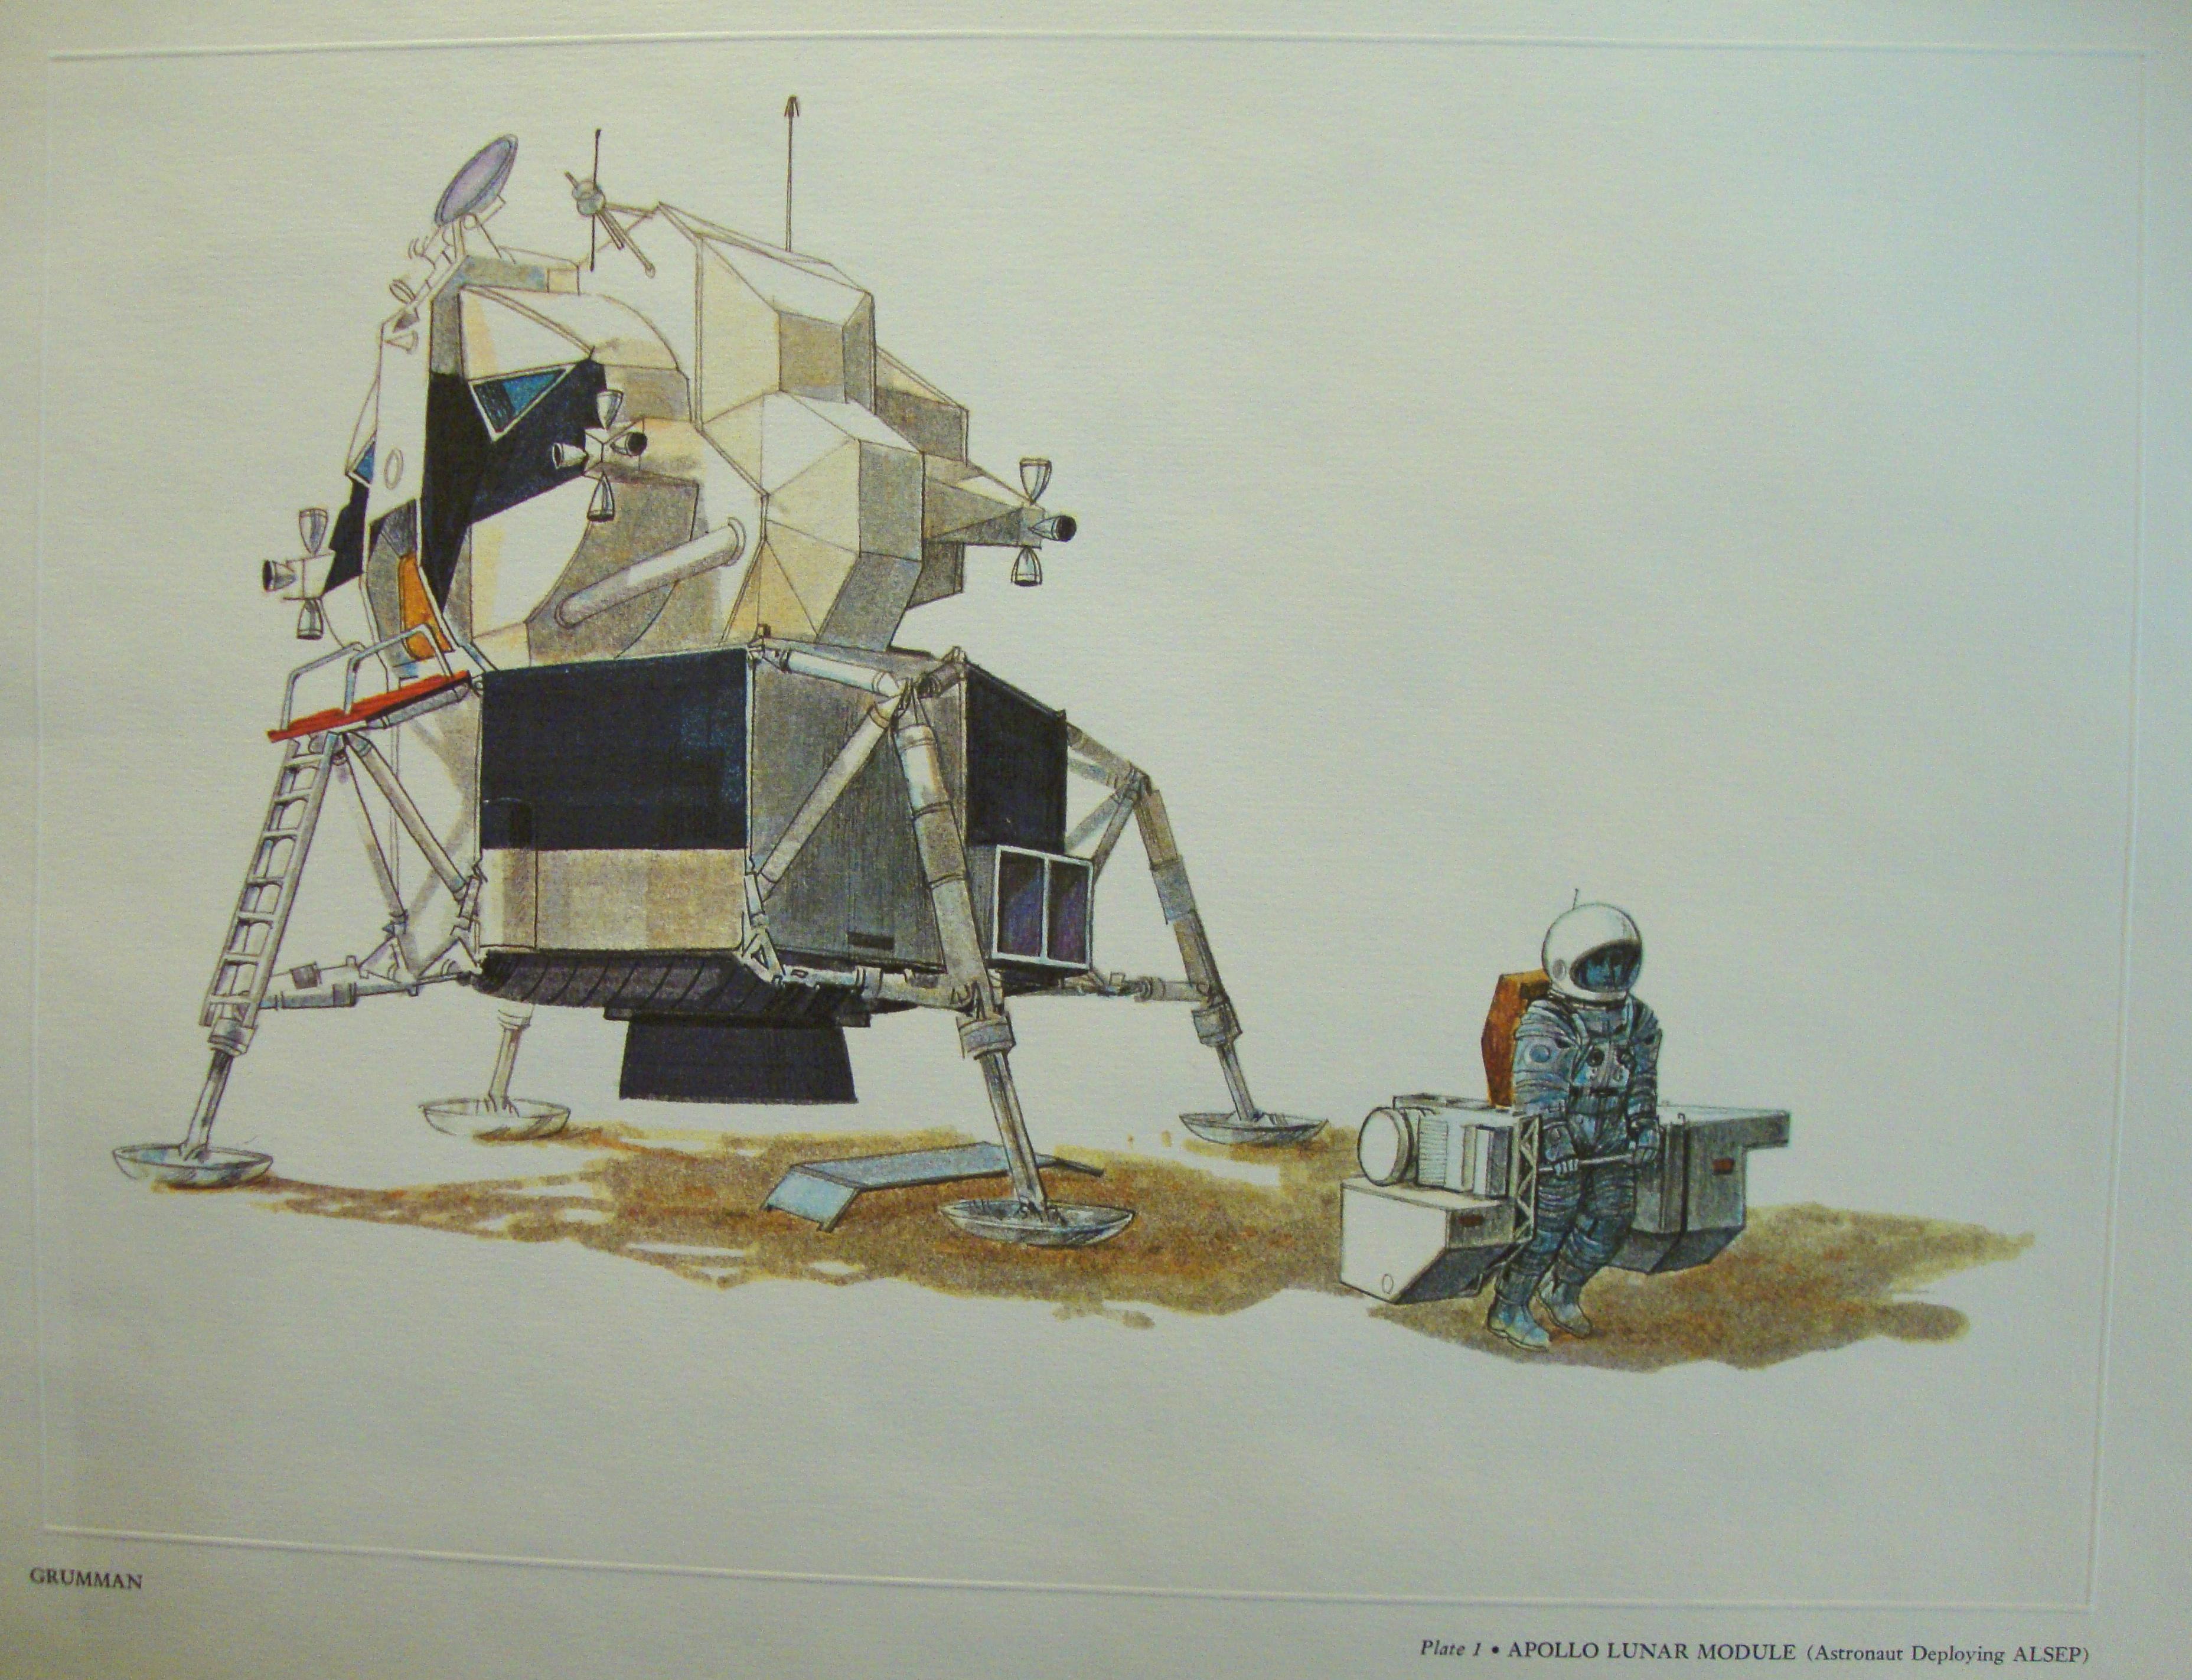 Grumman-LM1.JPG